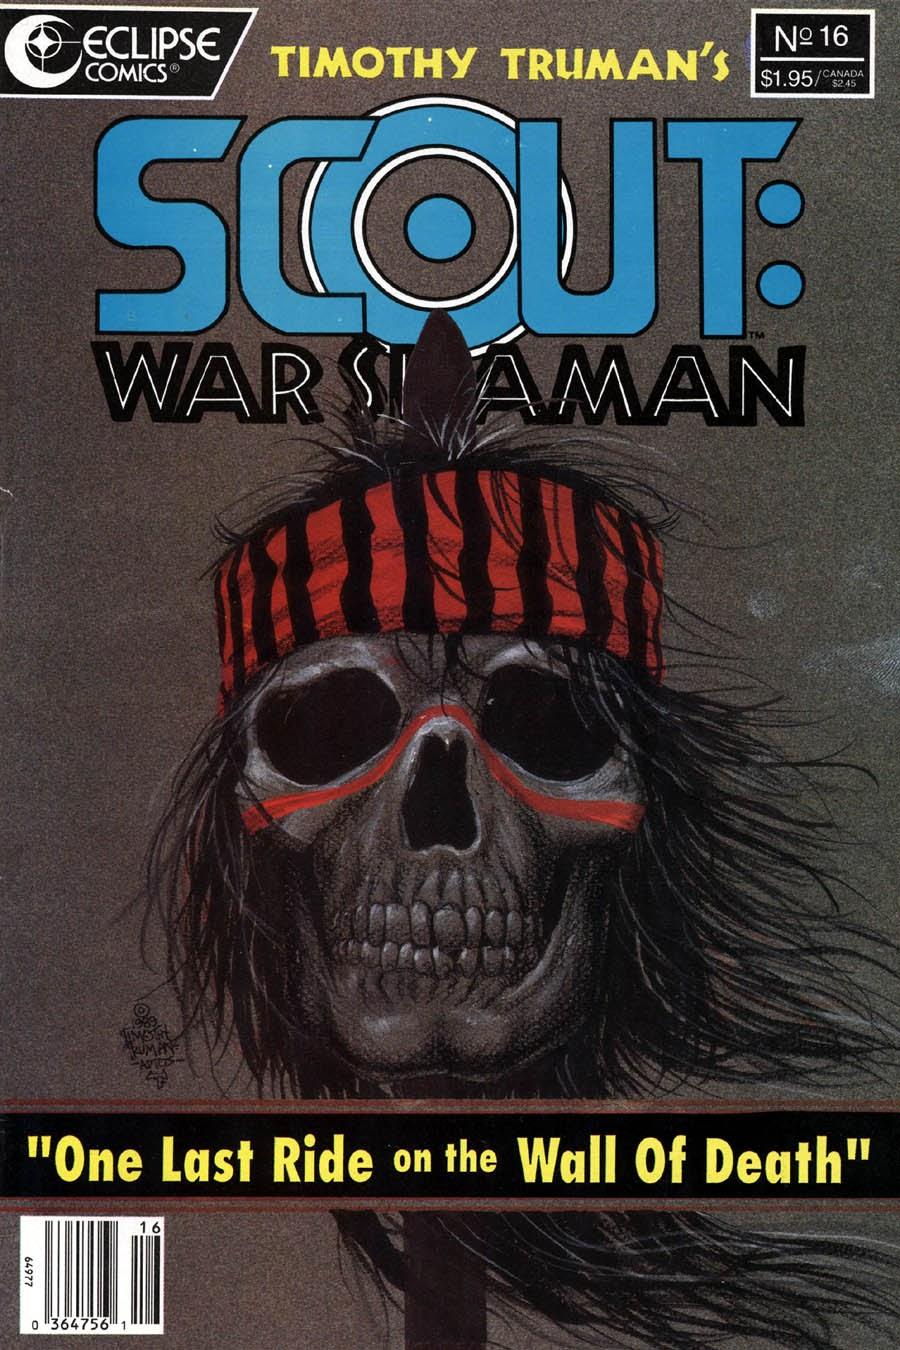 Scout: War Shaman 16 Page 1